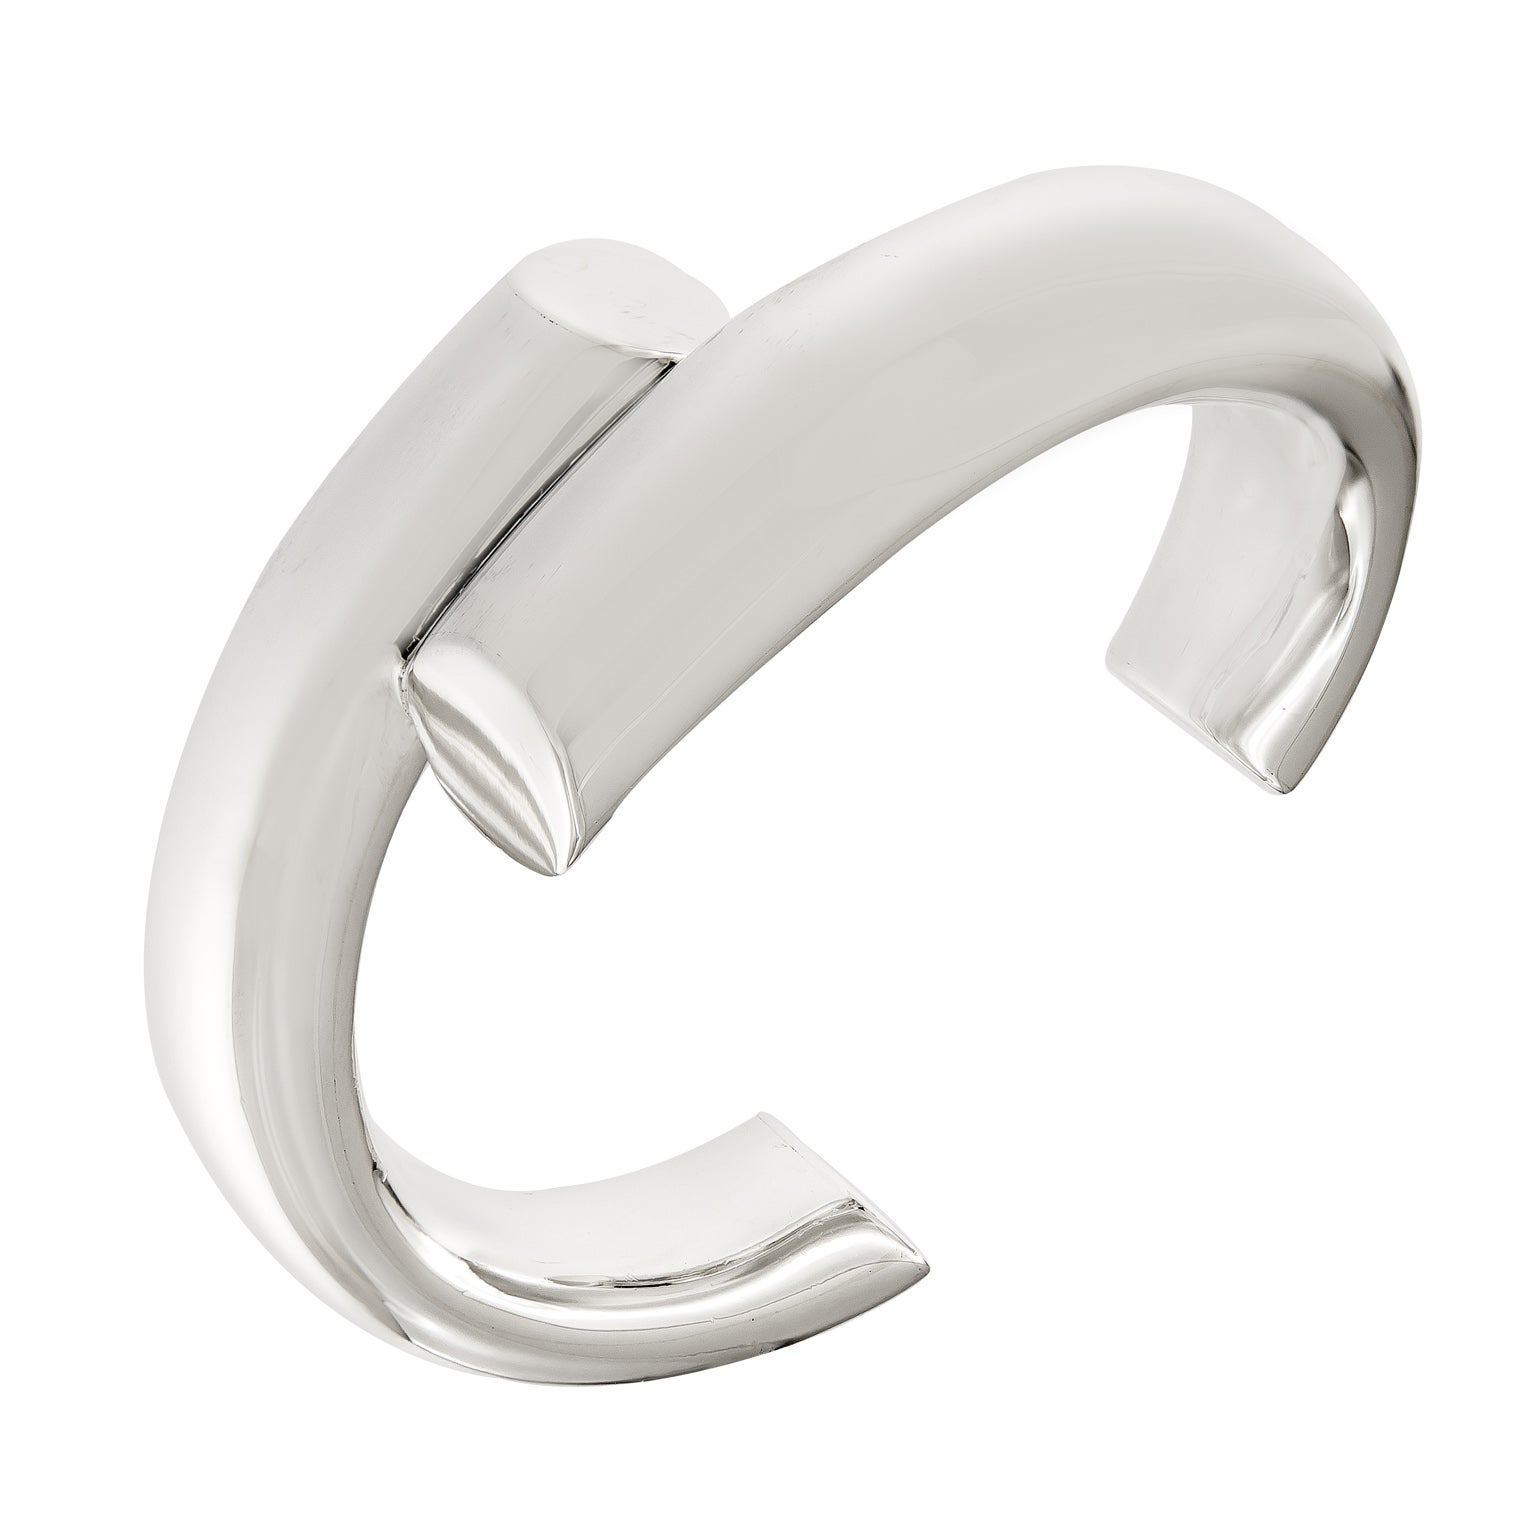 4b83577a5 Tiffany and Co. Elsa Peretti Sterling Silver Cuff Bracelet at 1stdibs